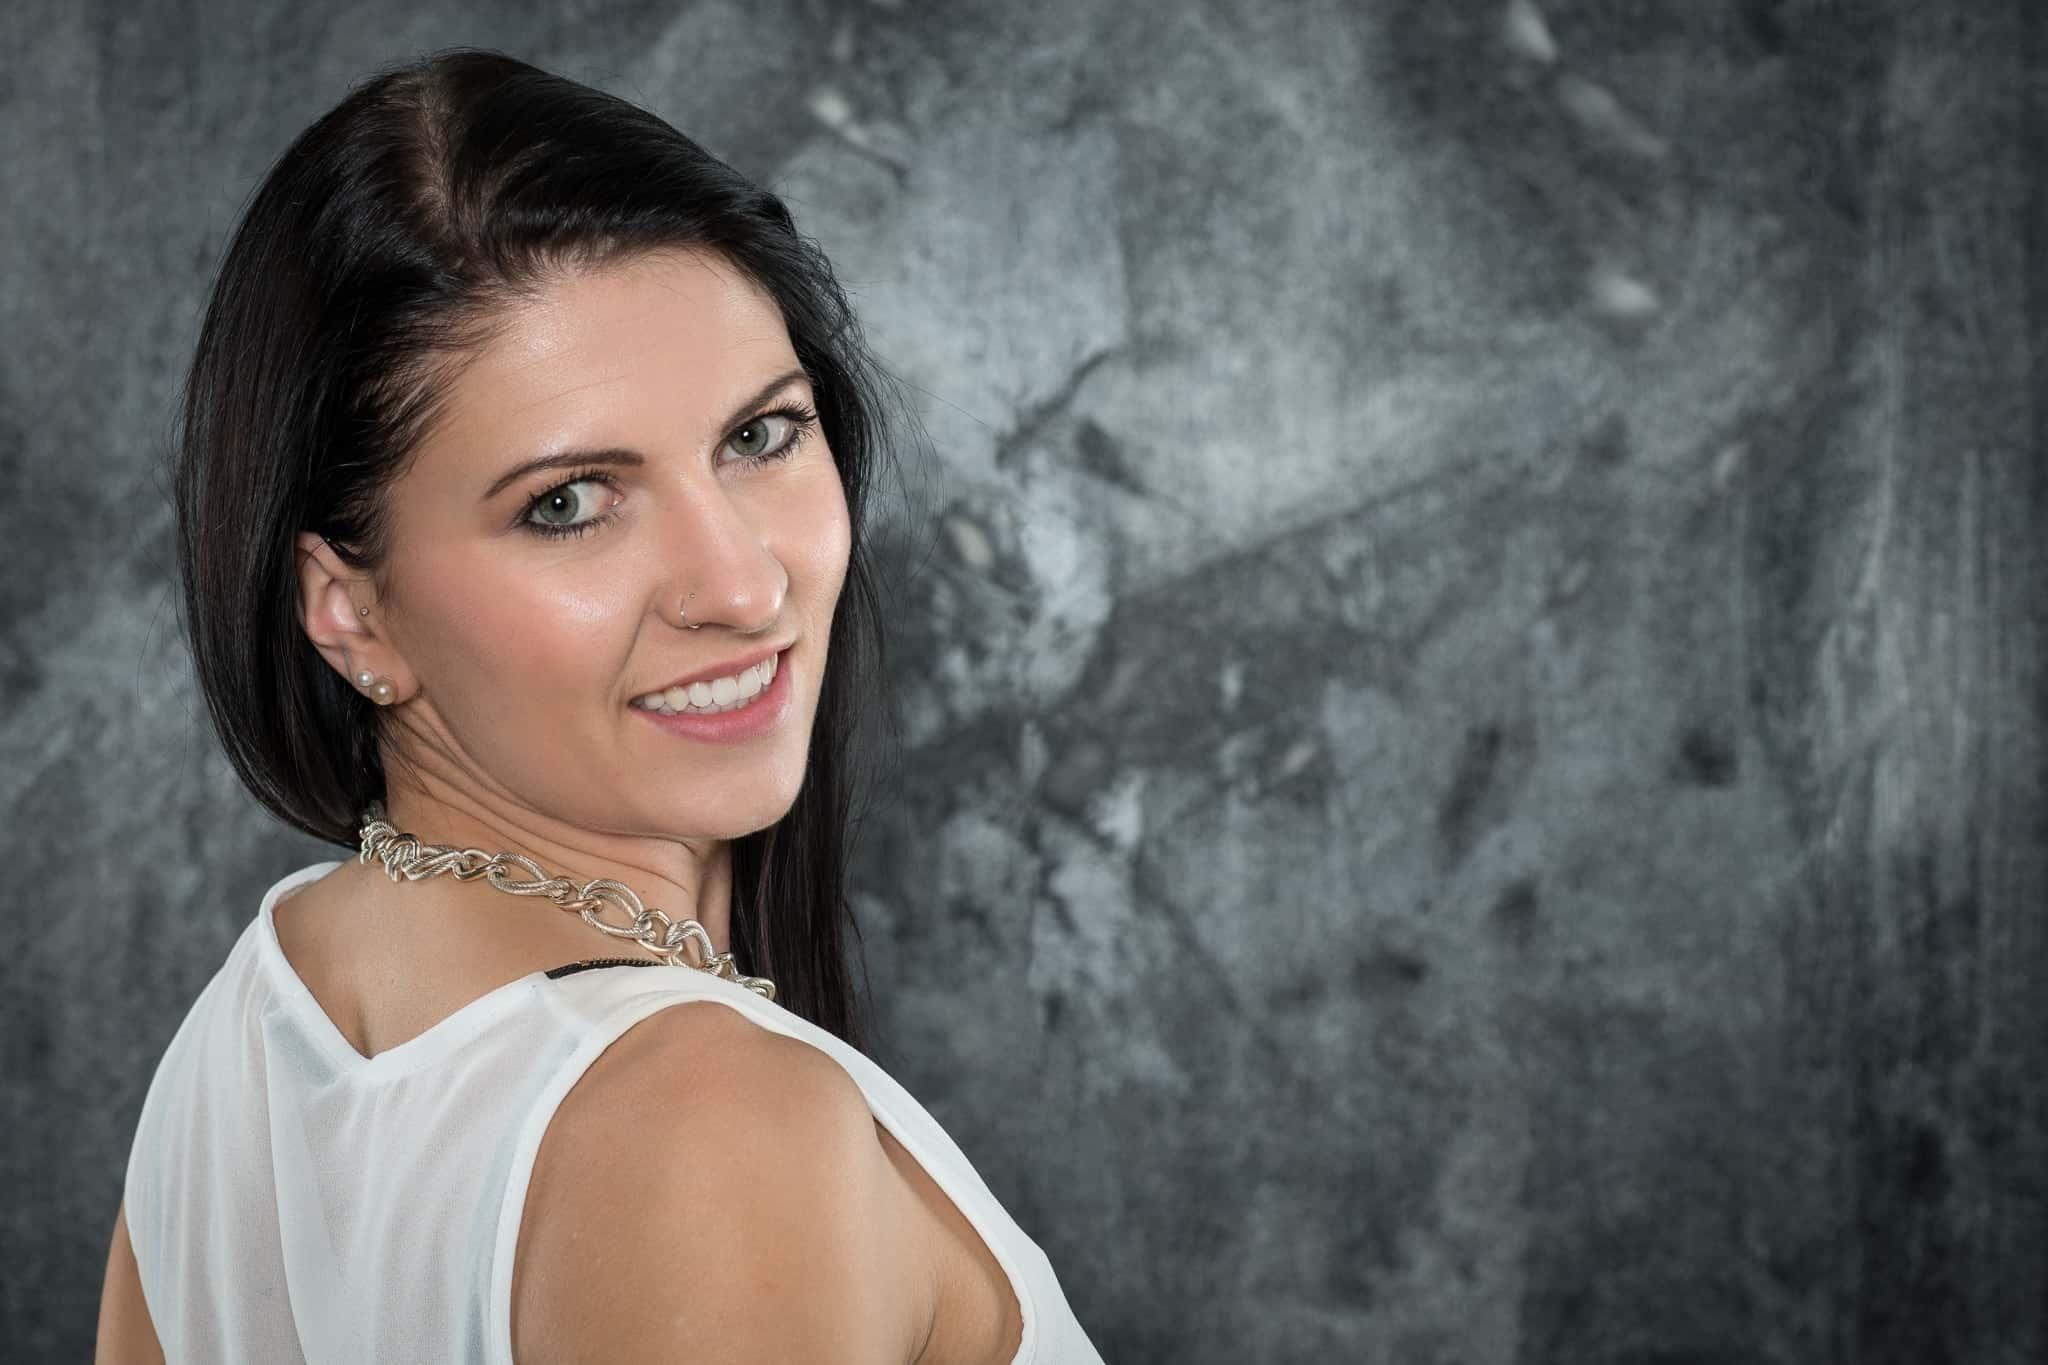 Portrait Fotoshooting Studio Bern